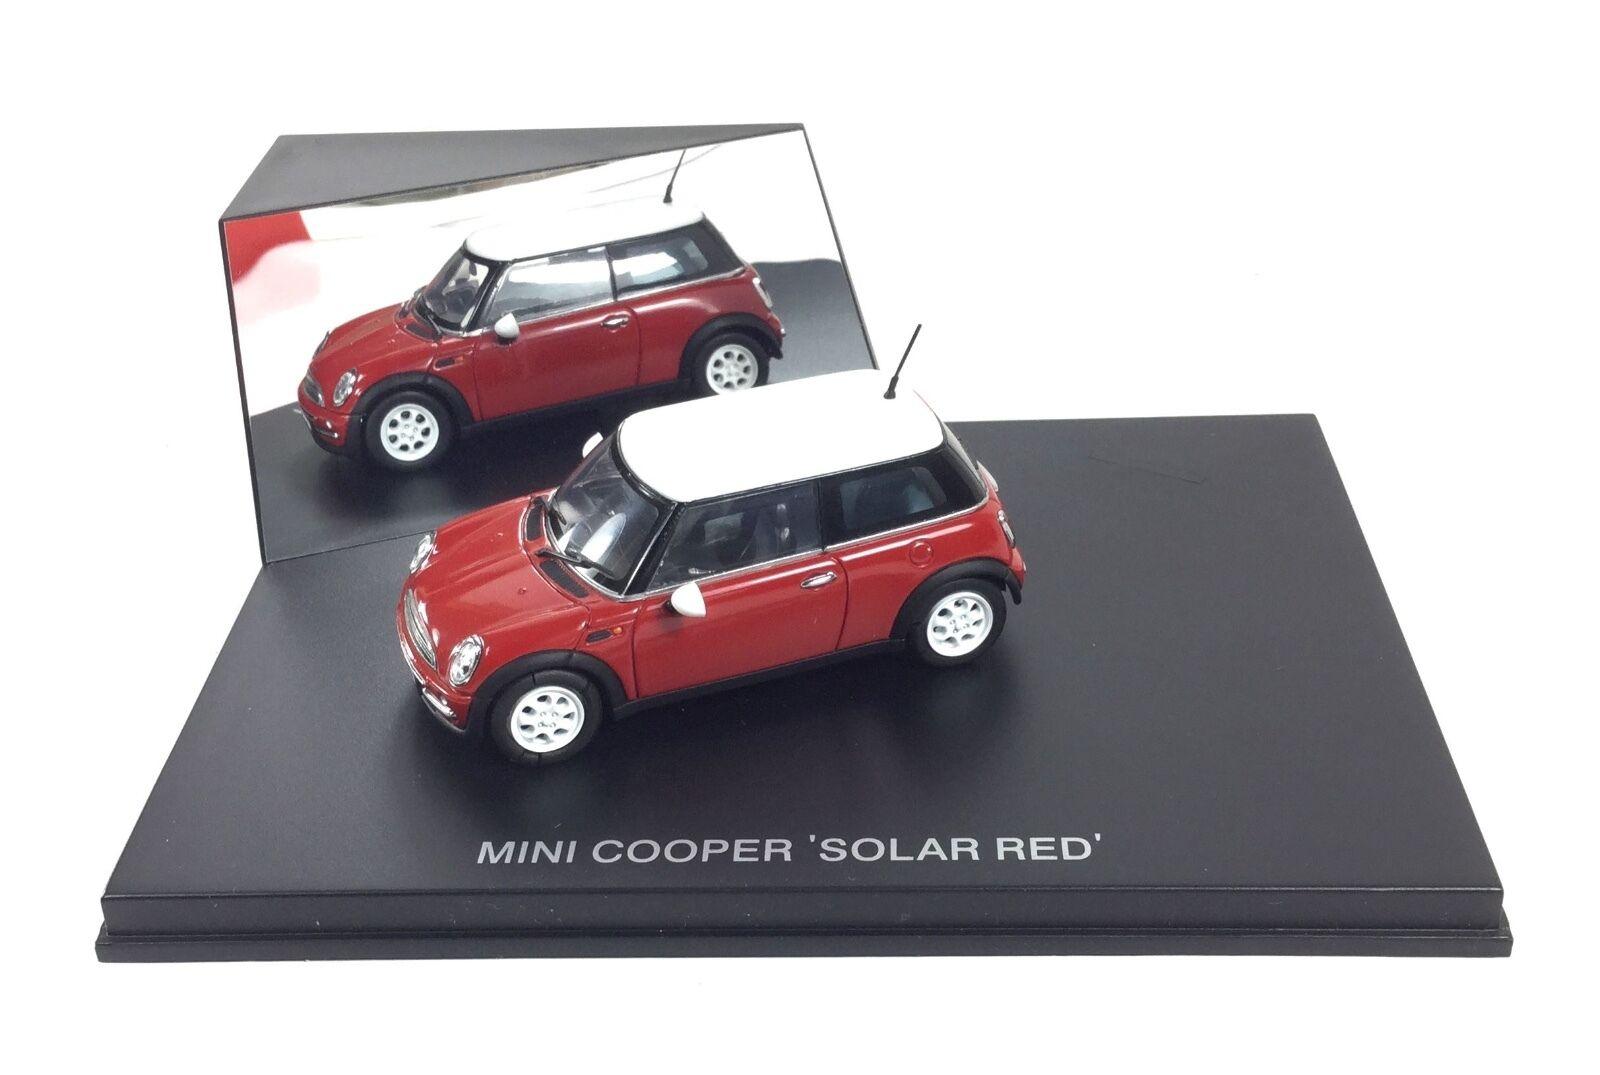 New Mini Cooper Cooper Cooper 2001 • Revell • Solar Red • Metal 1 43 Diecast • MINT BOXED OVP 0710cb